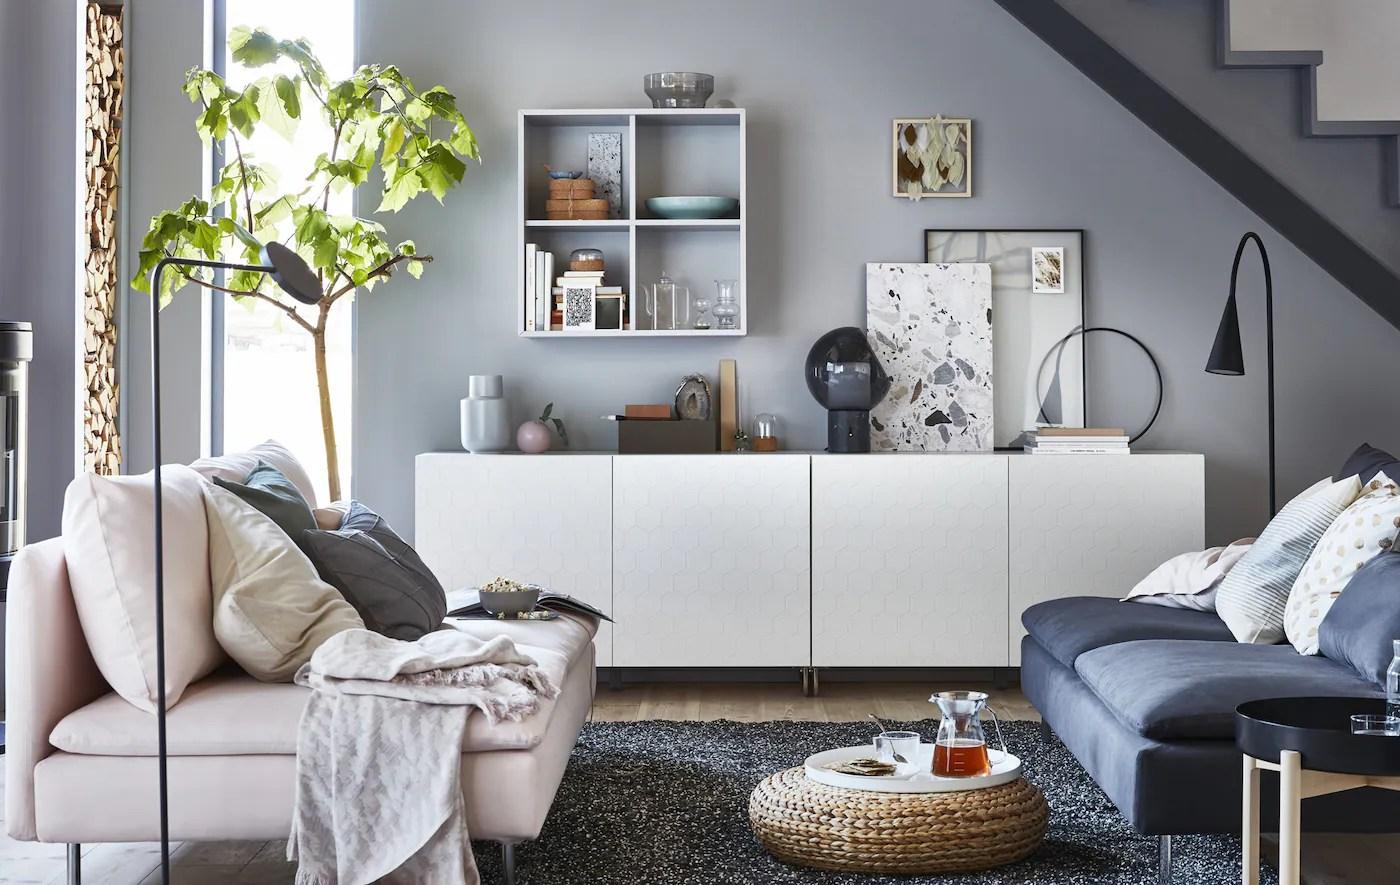 Stylish Storage With The New Look Besta Ikea